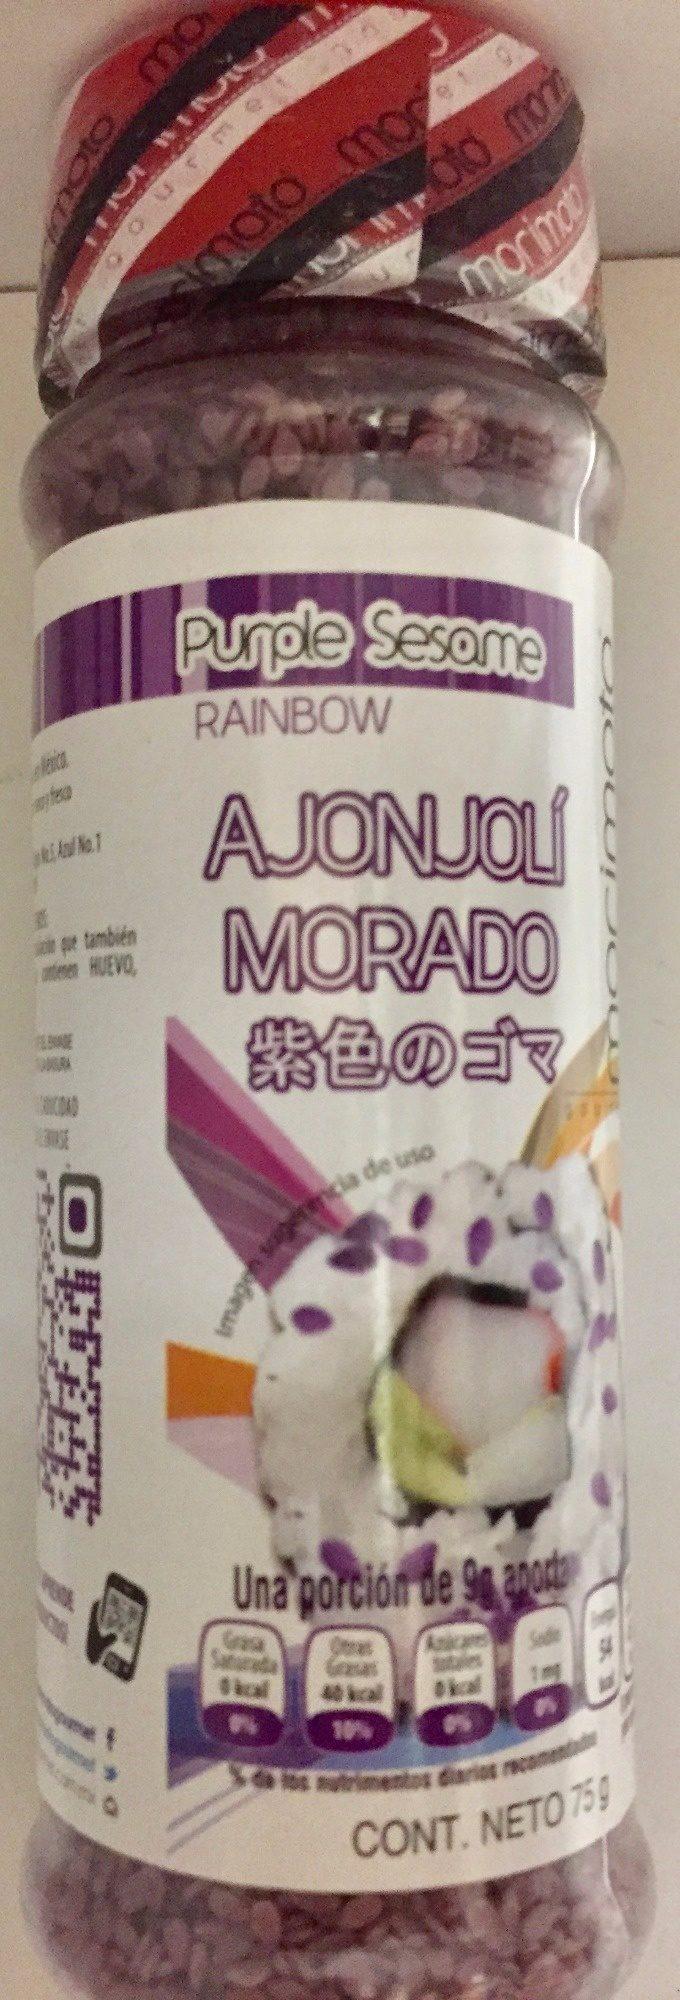 AJONJOLI MORADO - Product - es